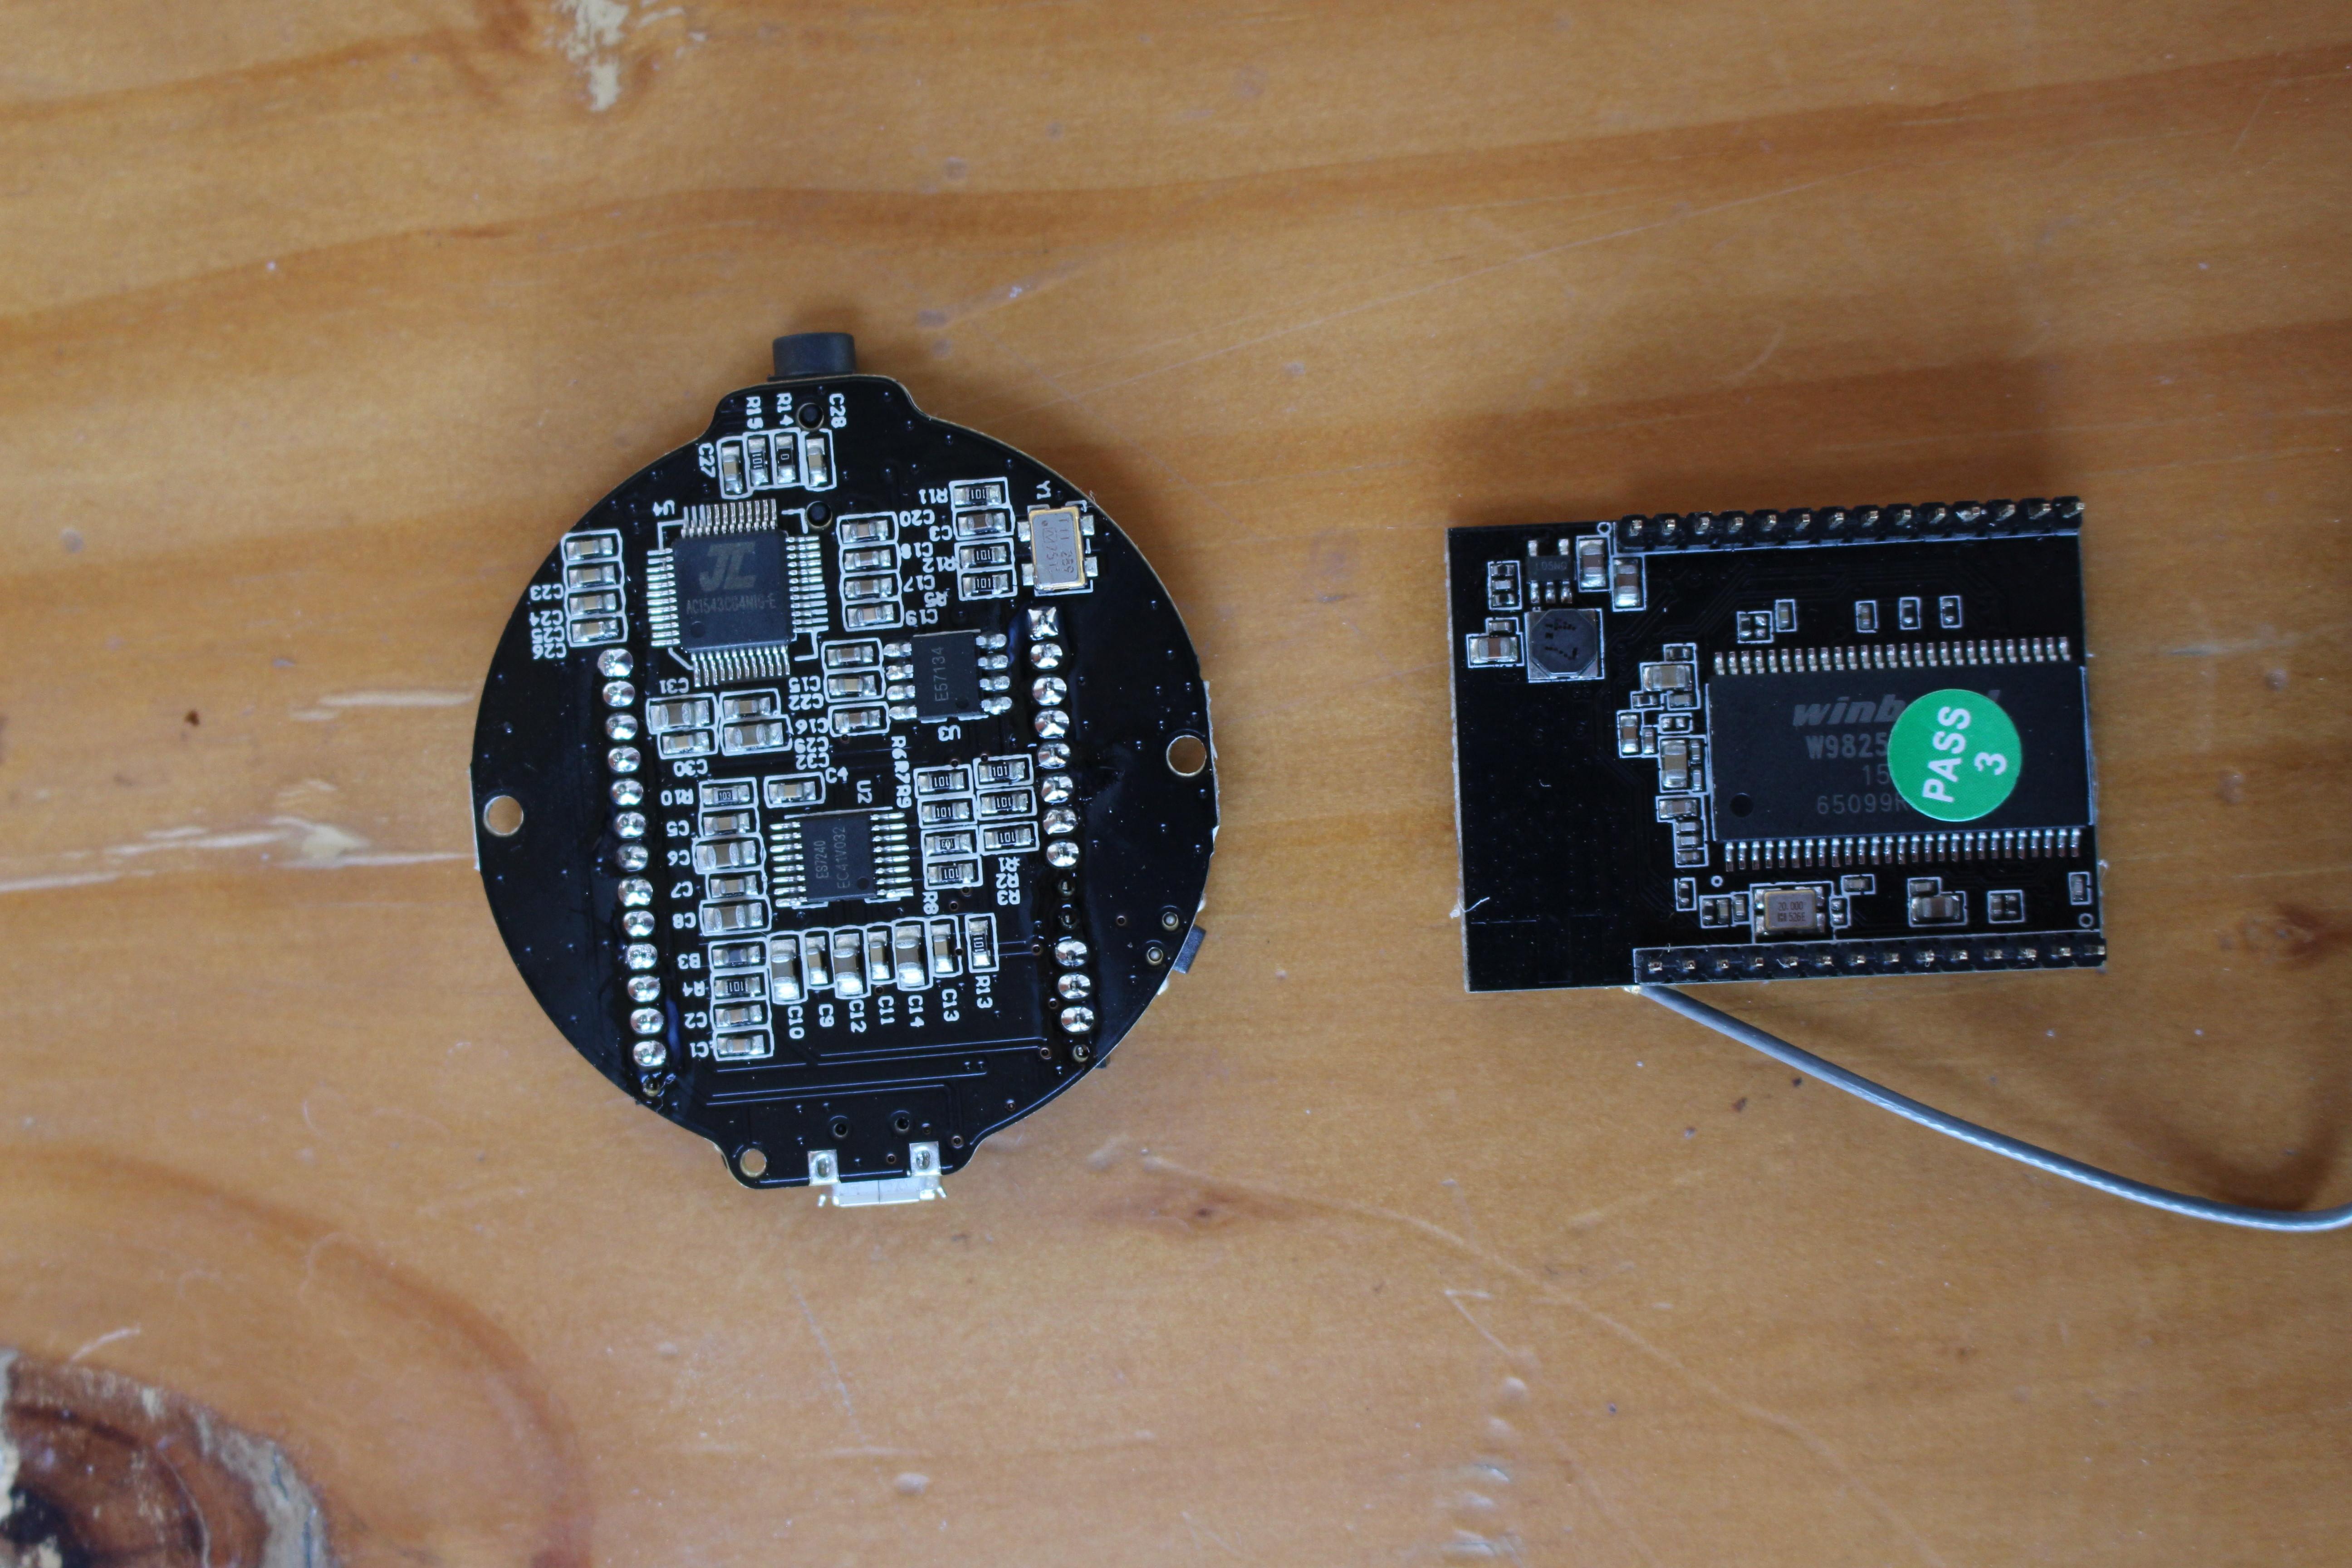 AudioCast M5 is a ChromeCast Audio Alternative with Local